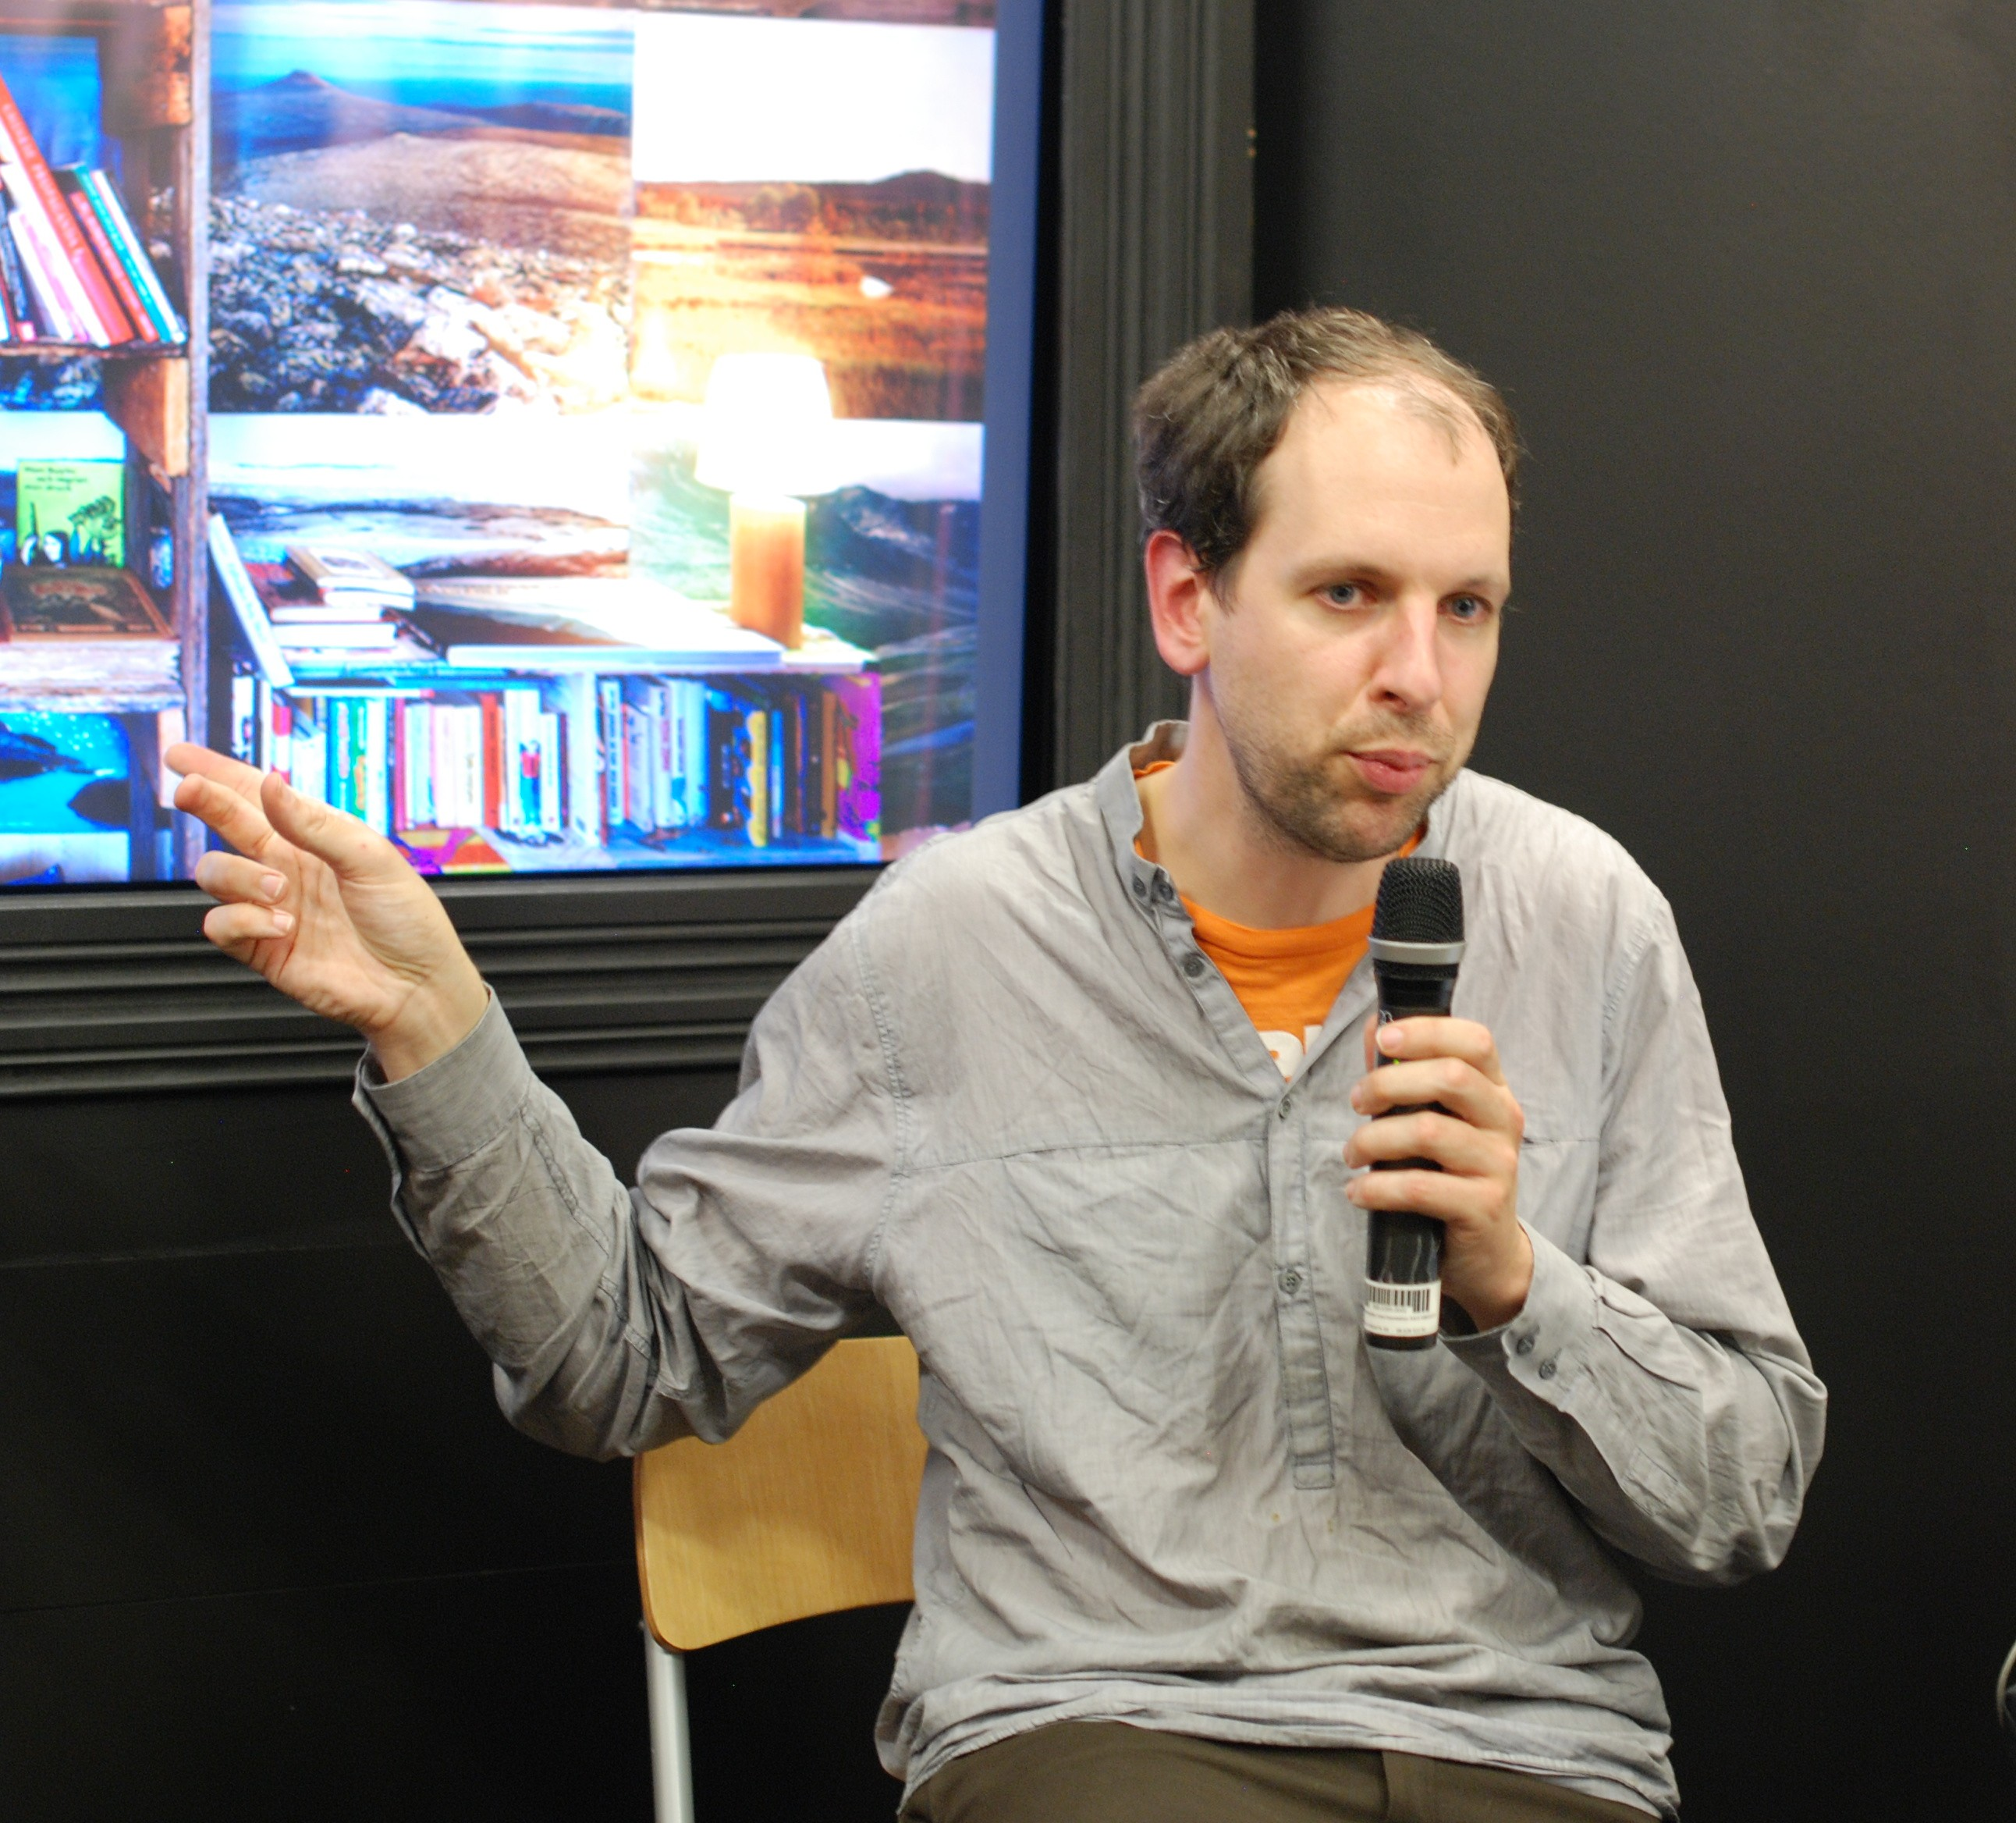 Image of Hendrik Zeitler from Wikidata